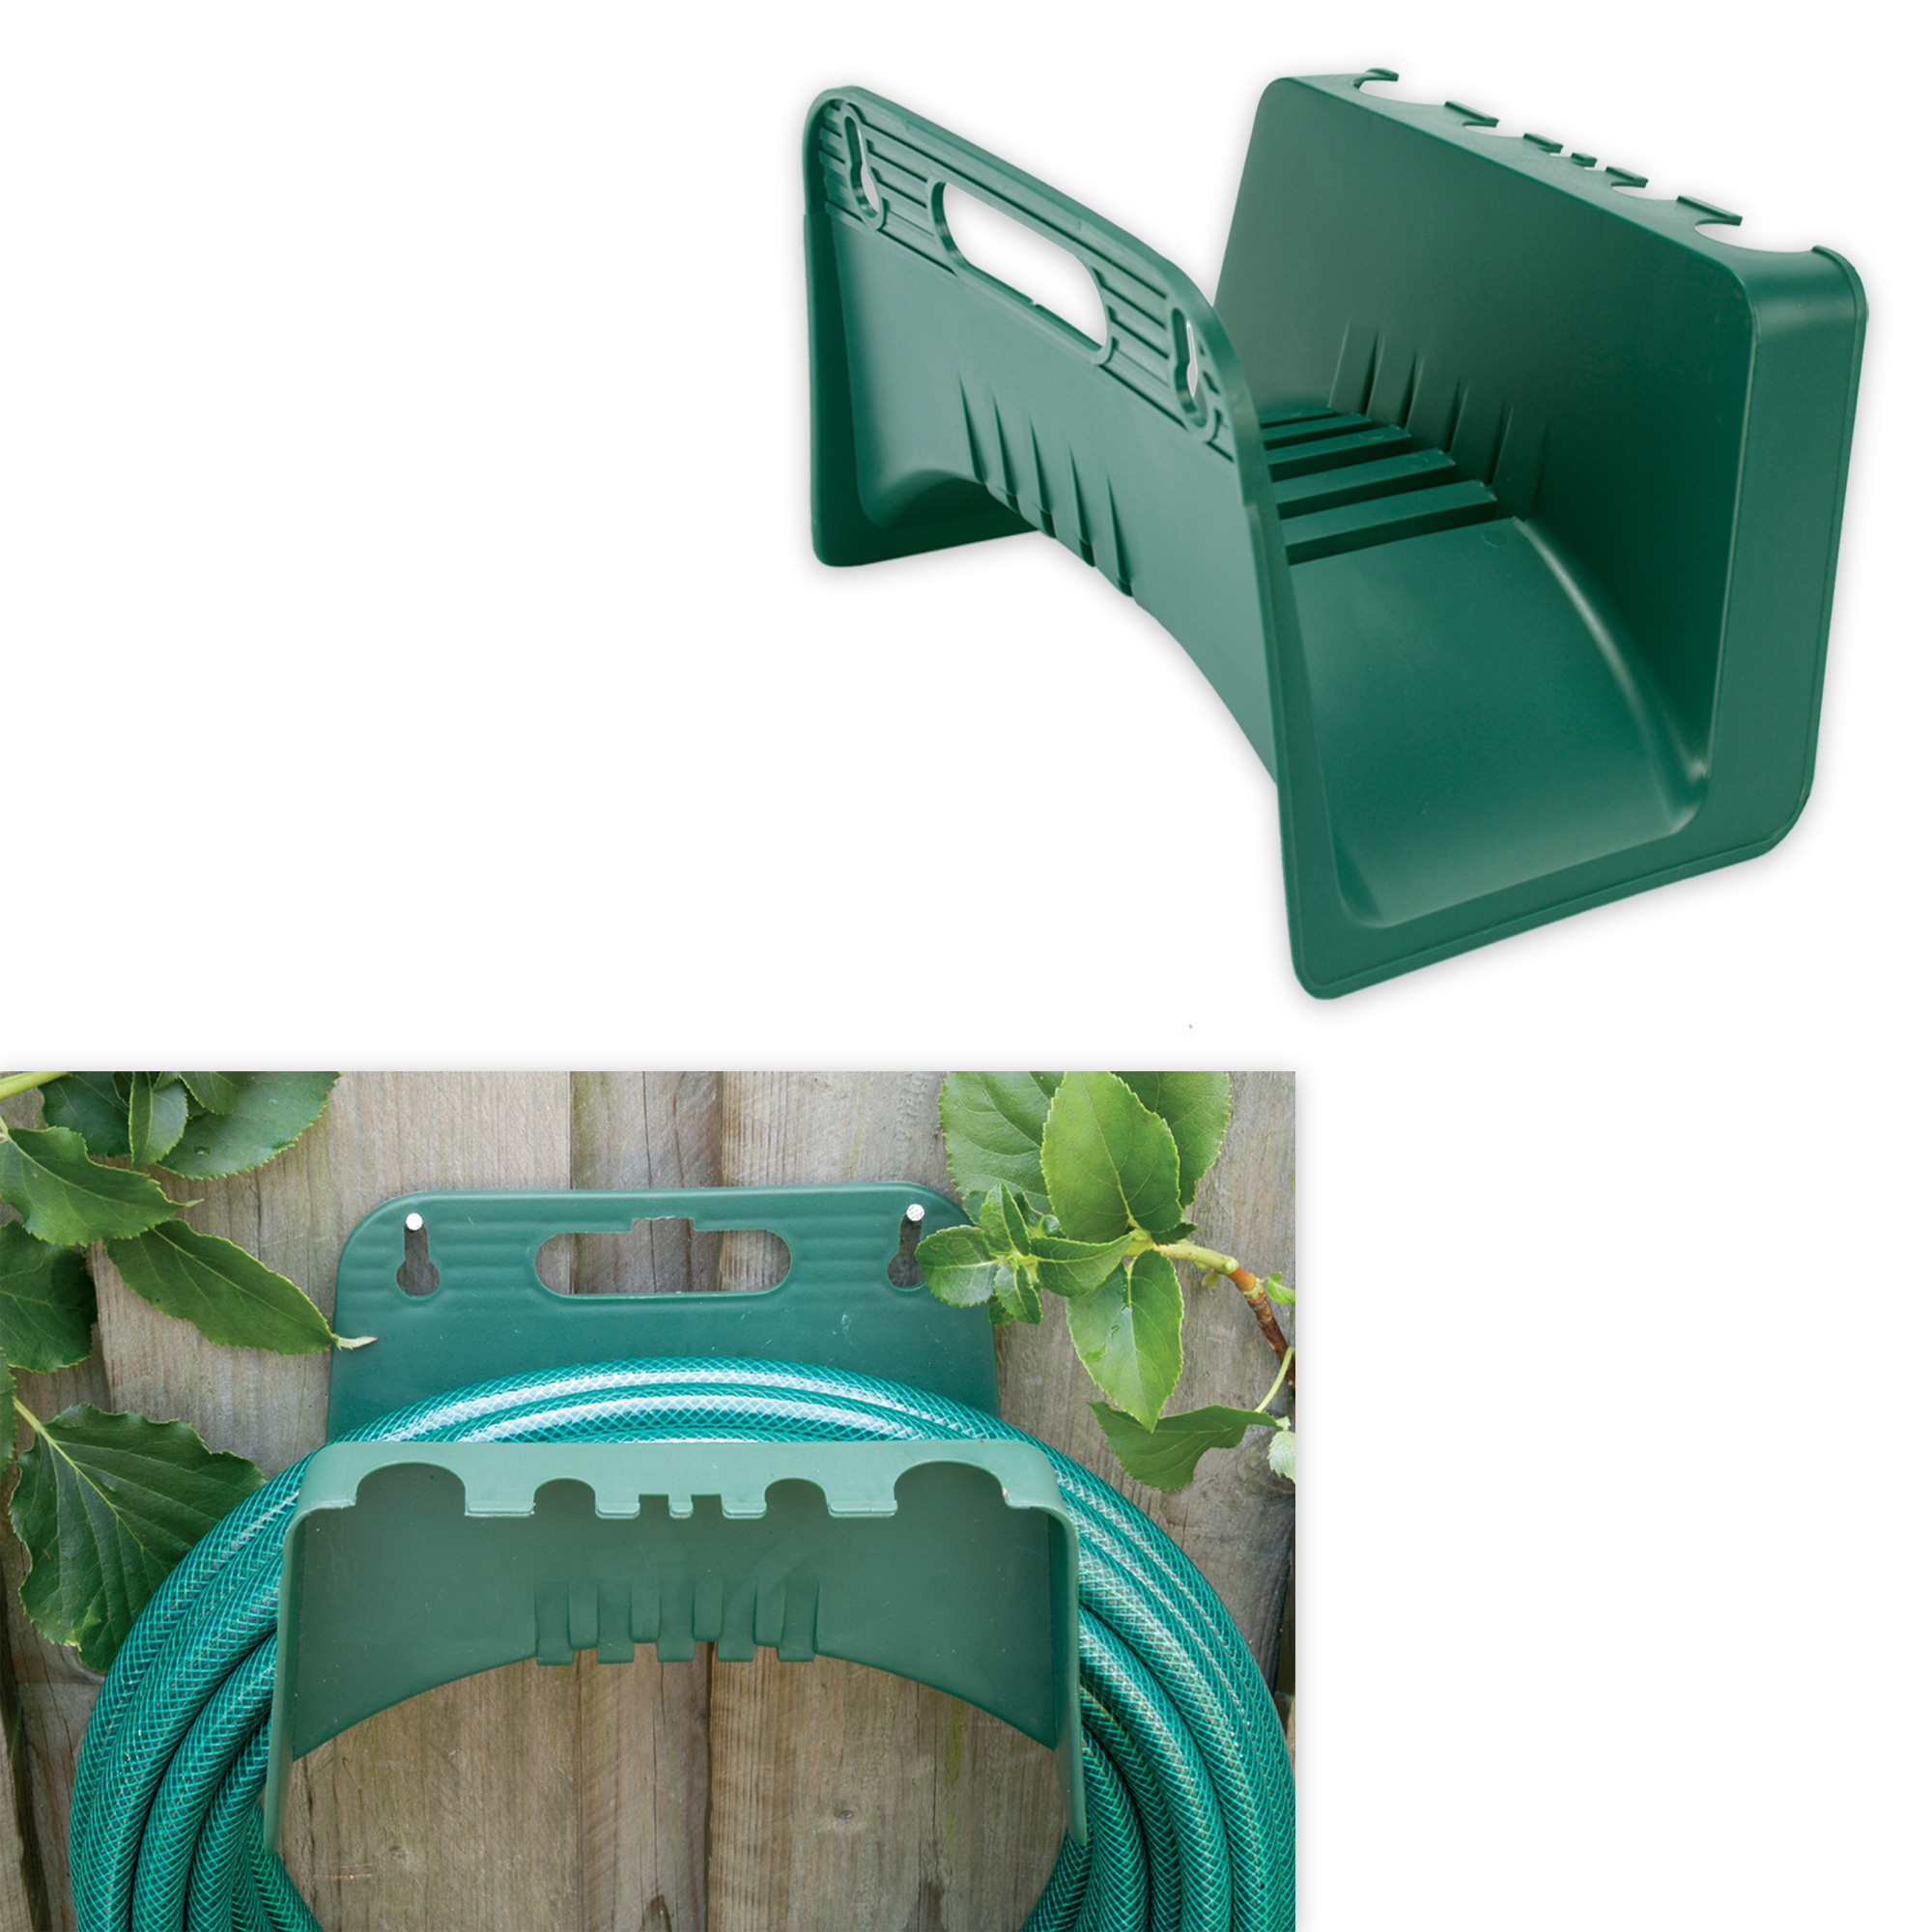 Garden Hose Bracket: Practical Wall Bracket For Garden Hose Plastic In Dark